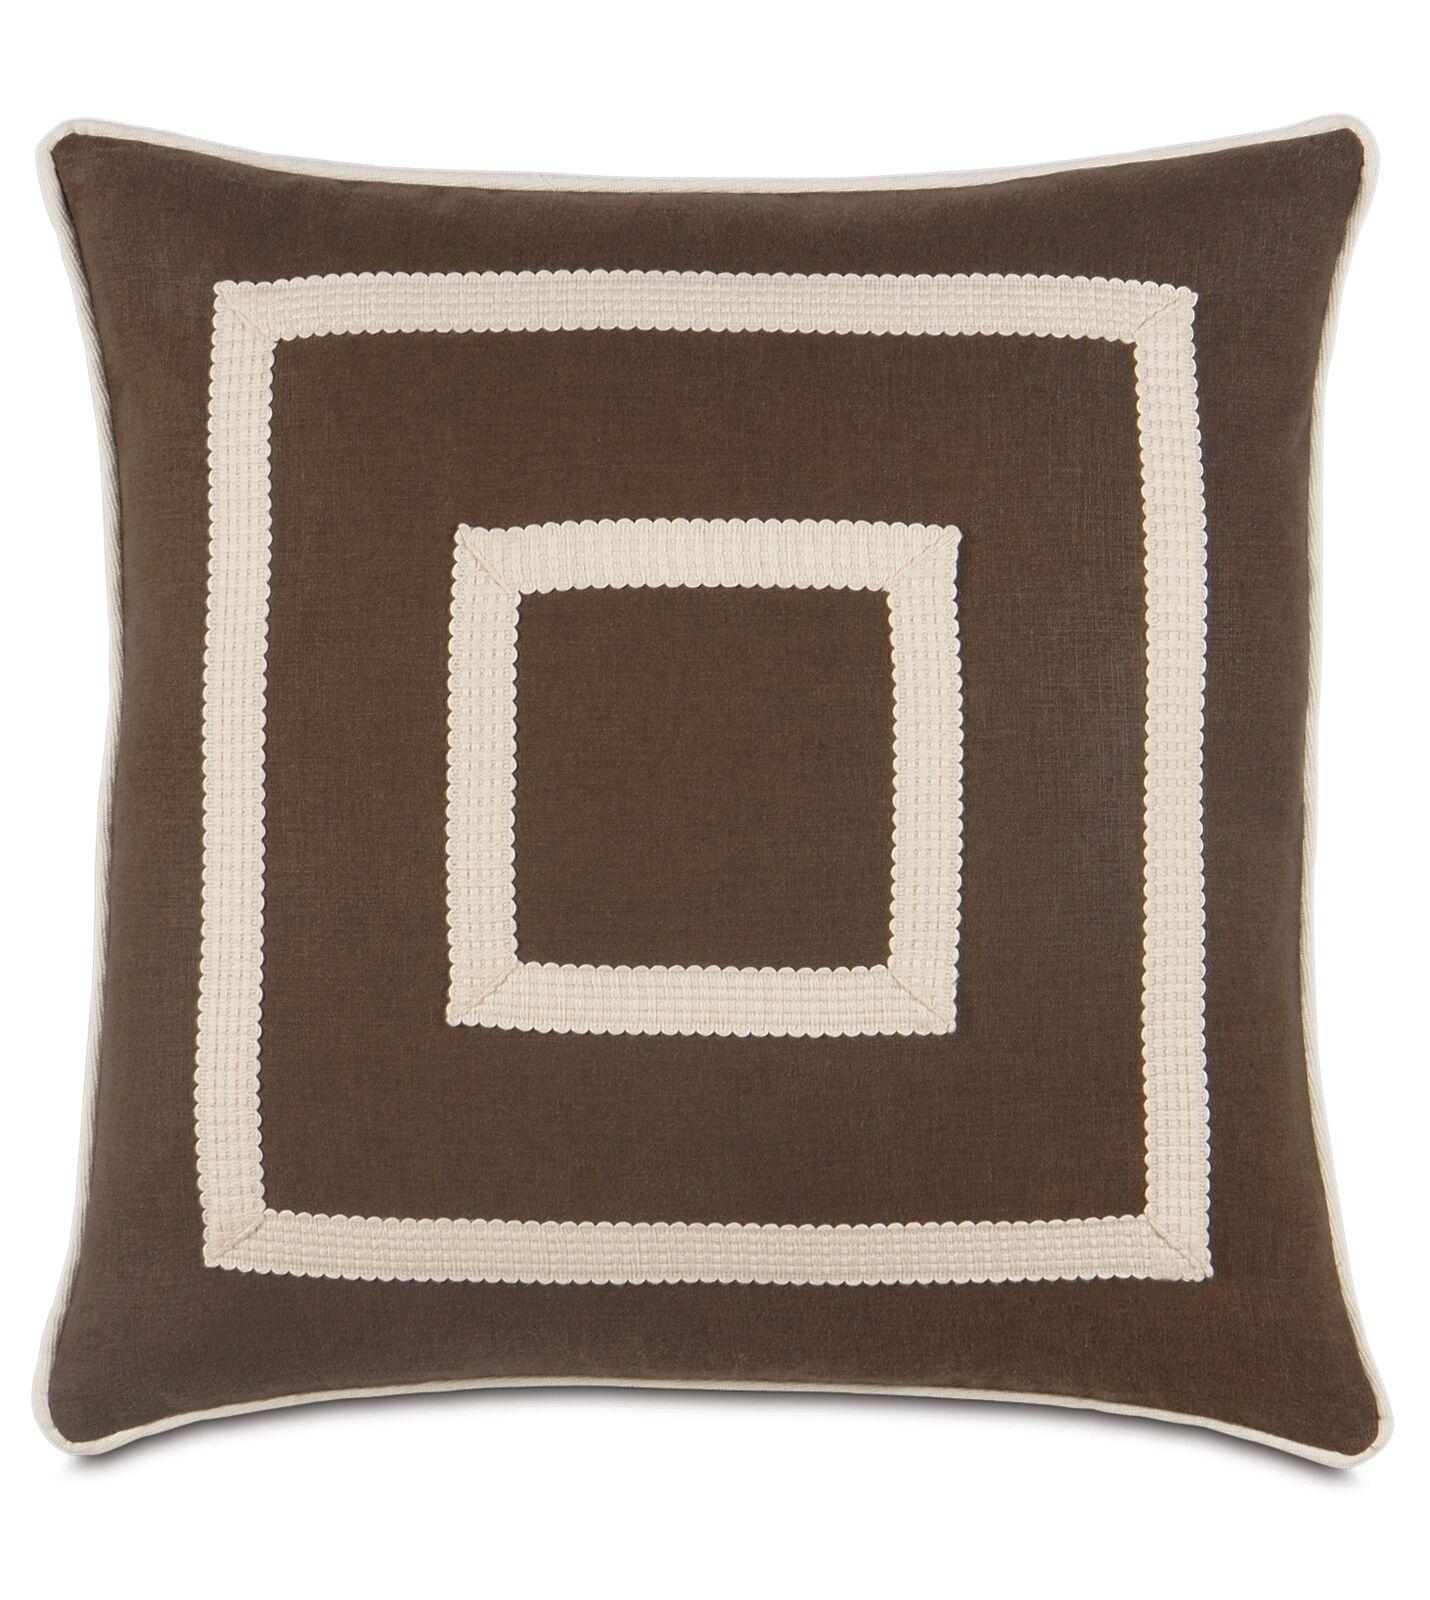 Kira Leon Throw Pillow